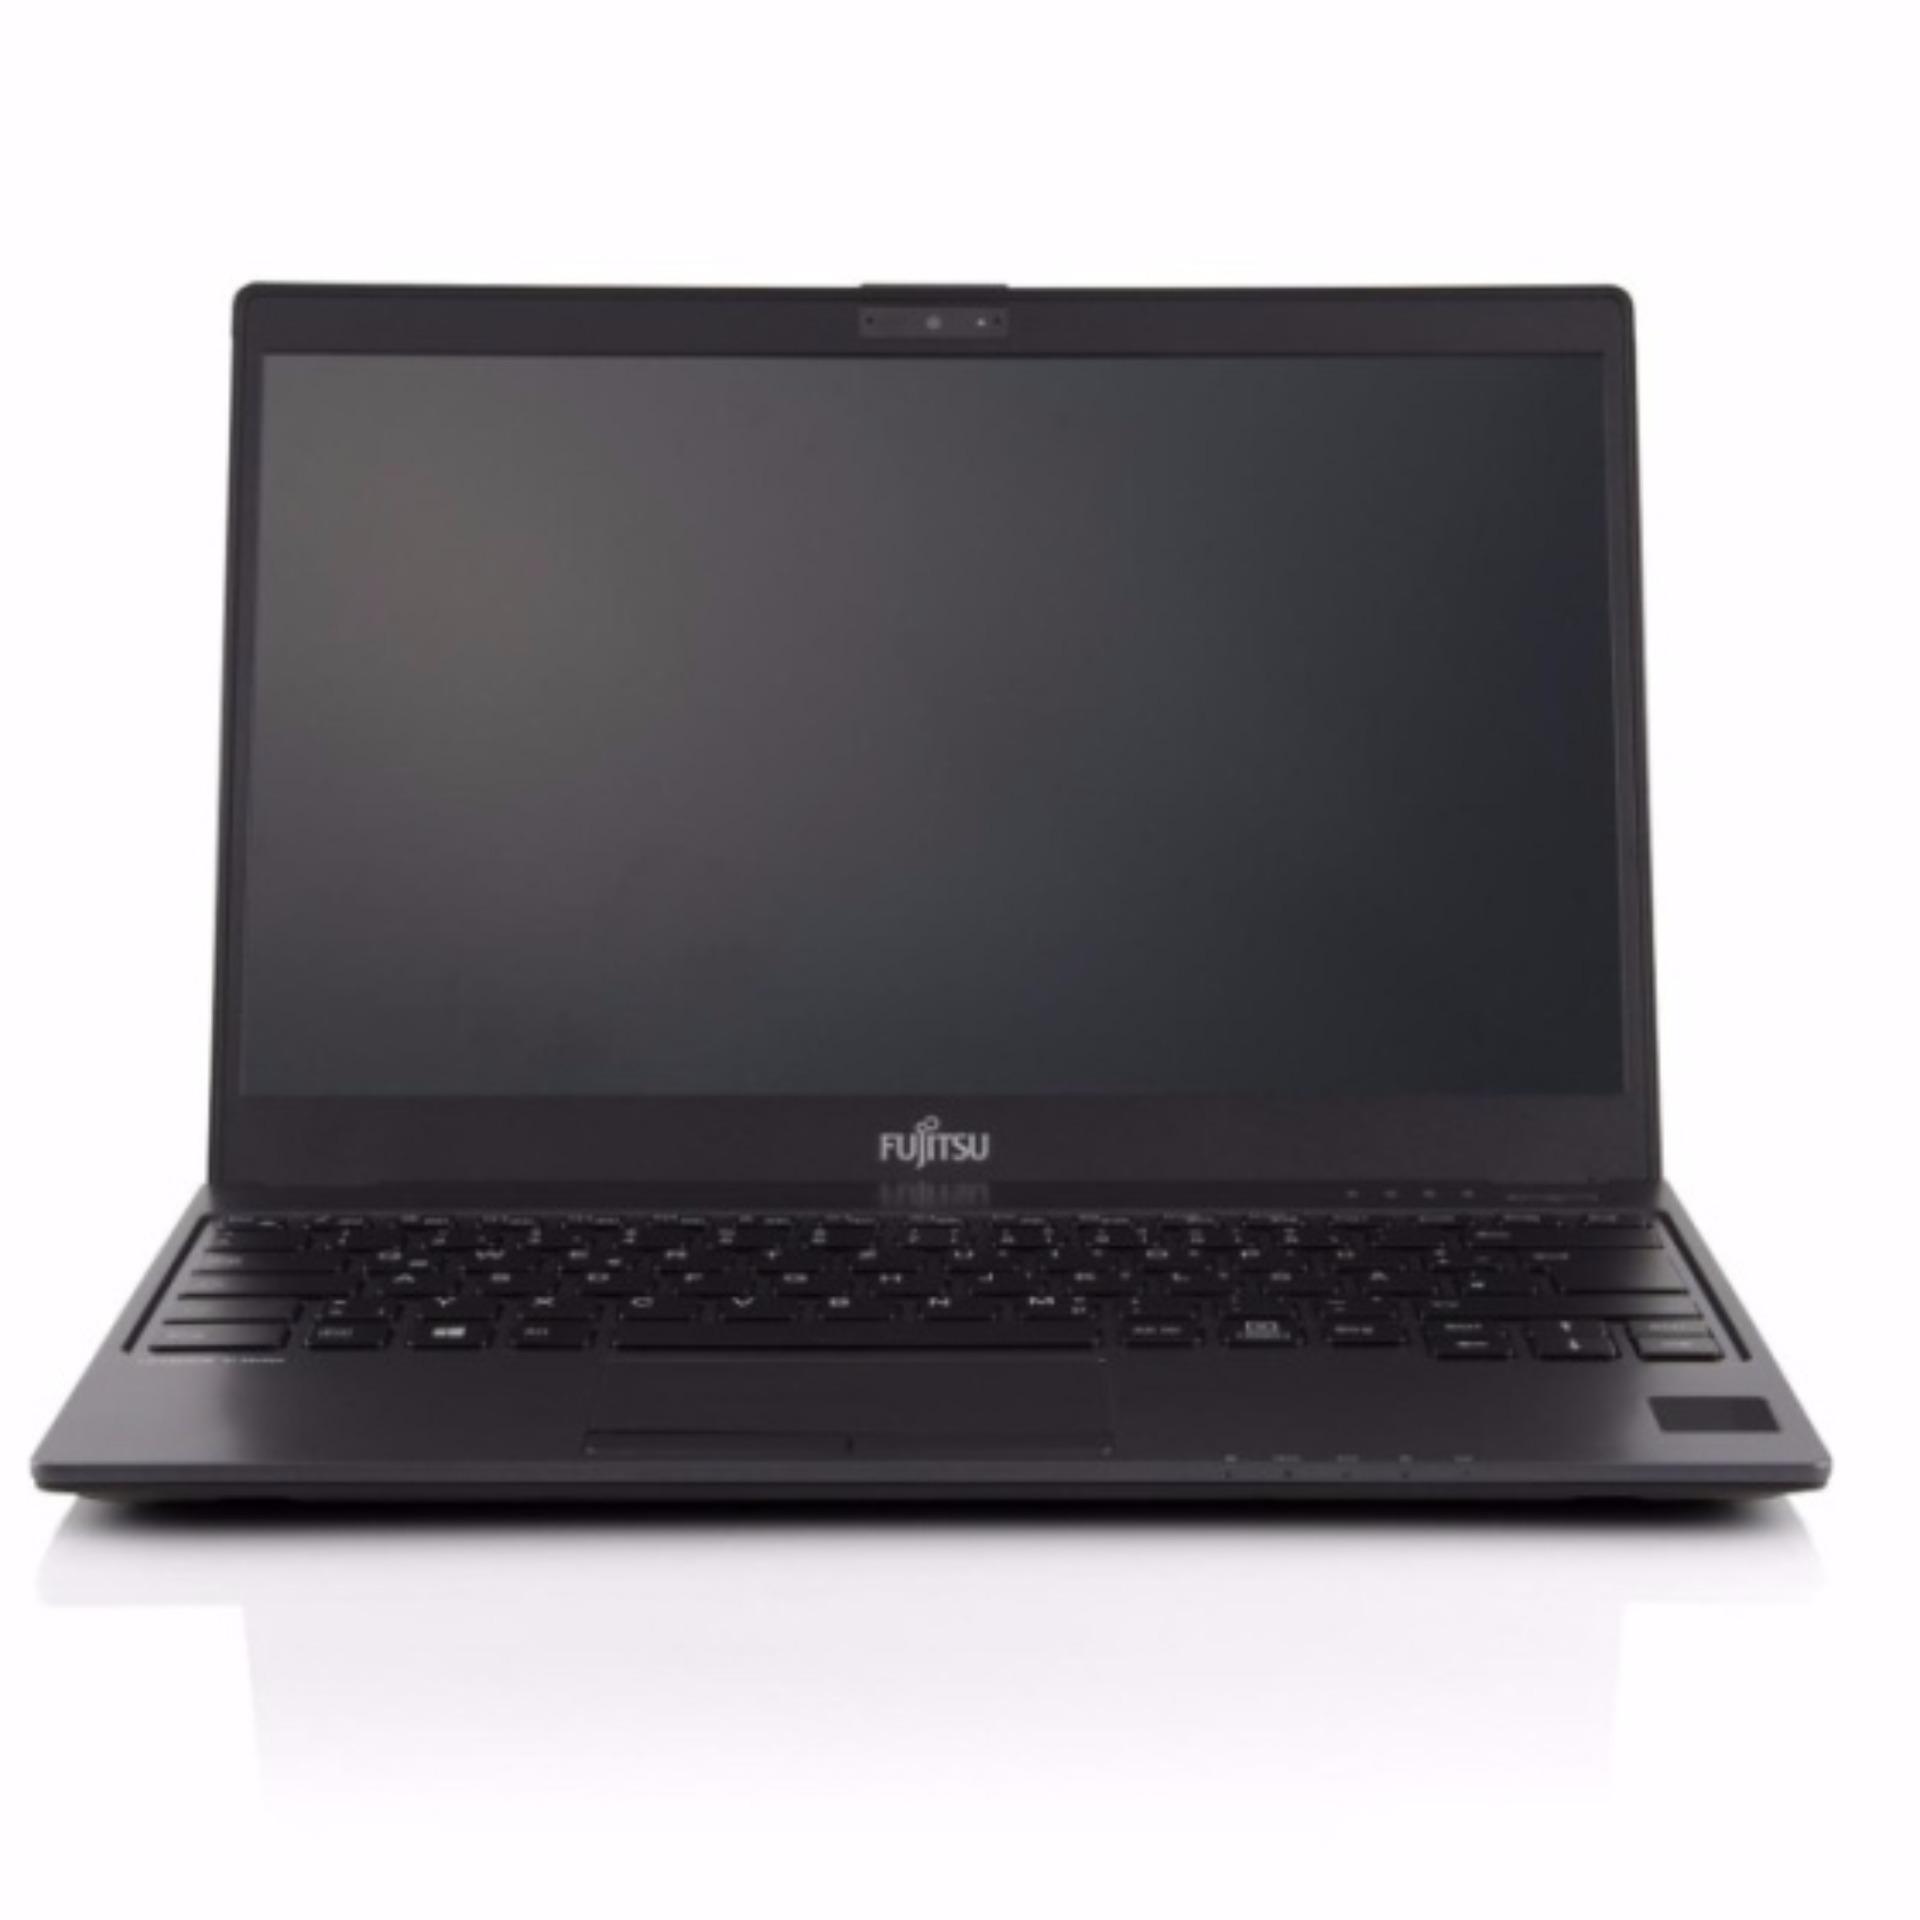 FUJITSU LIFEBOOK U937B7S5W10P – I7-7600U,20GB,512GB,W10P